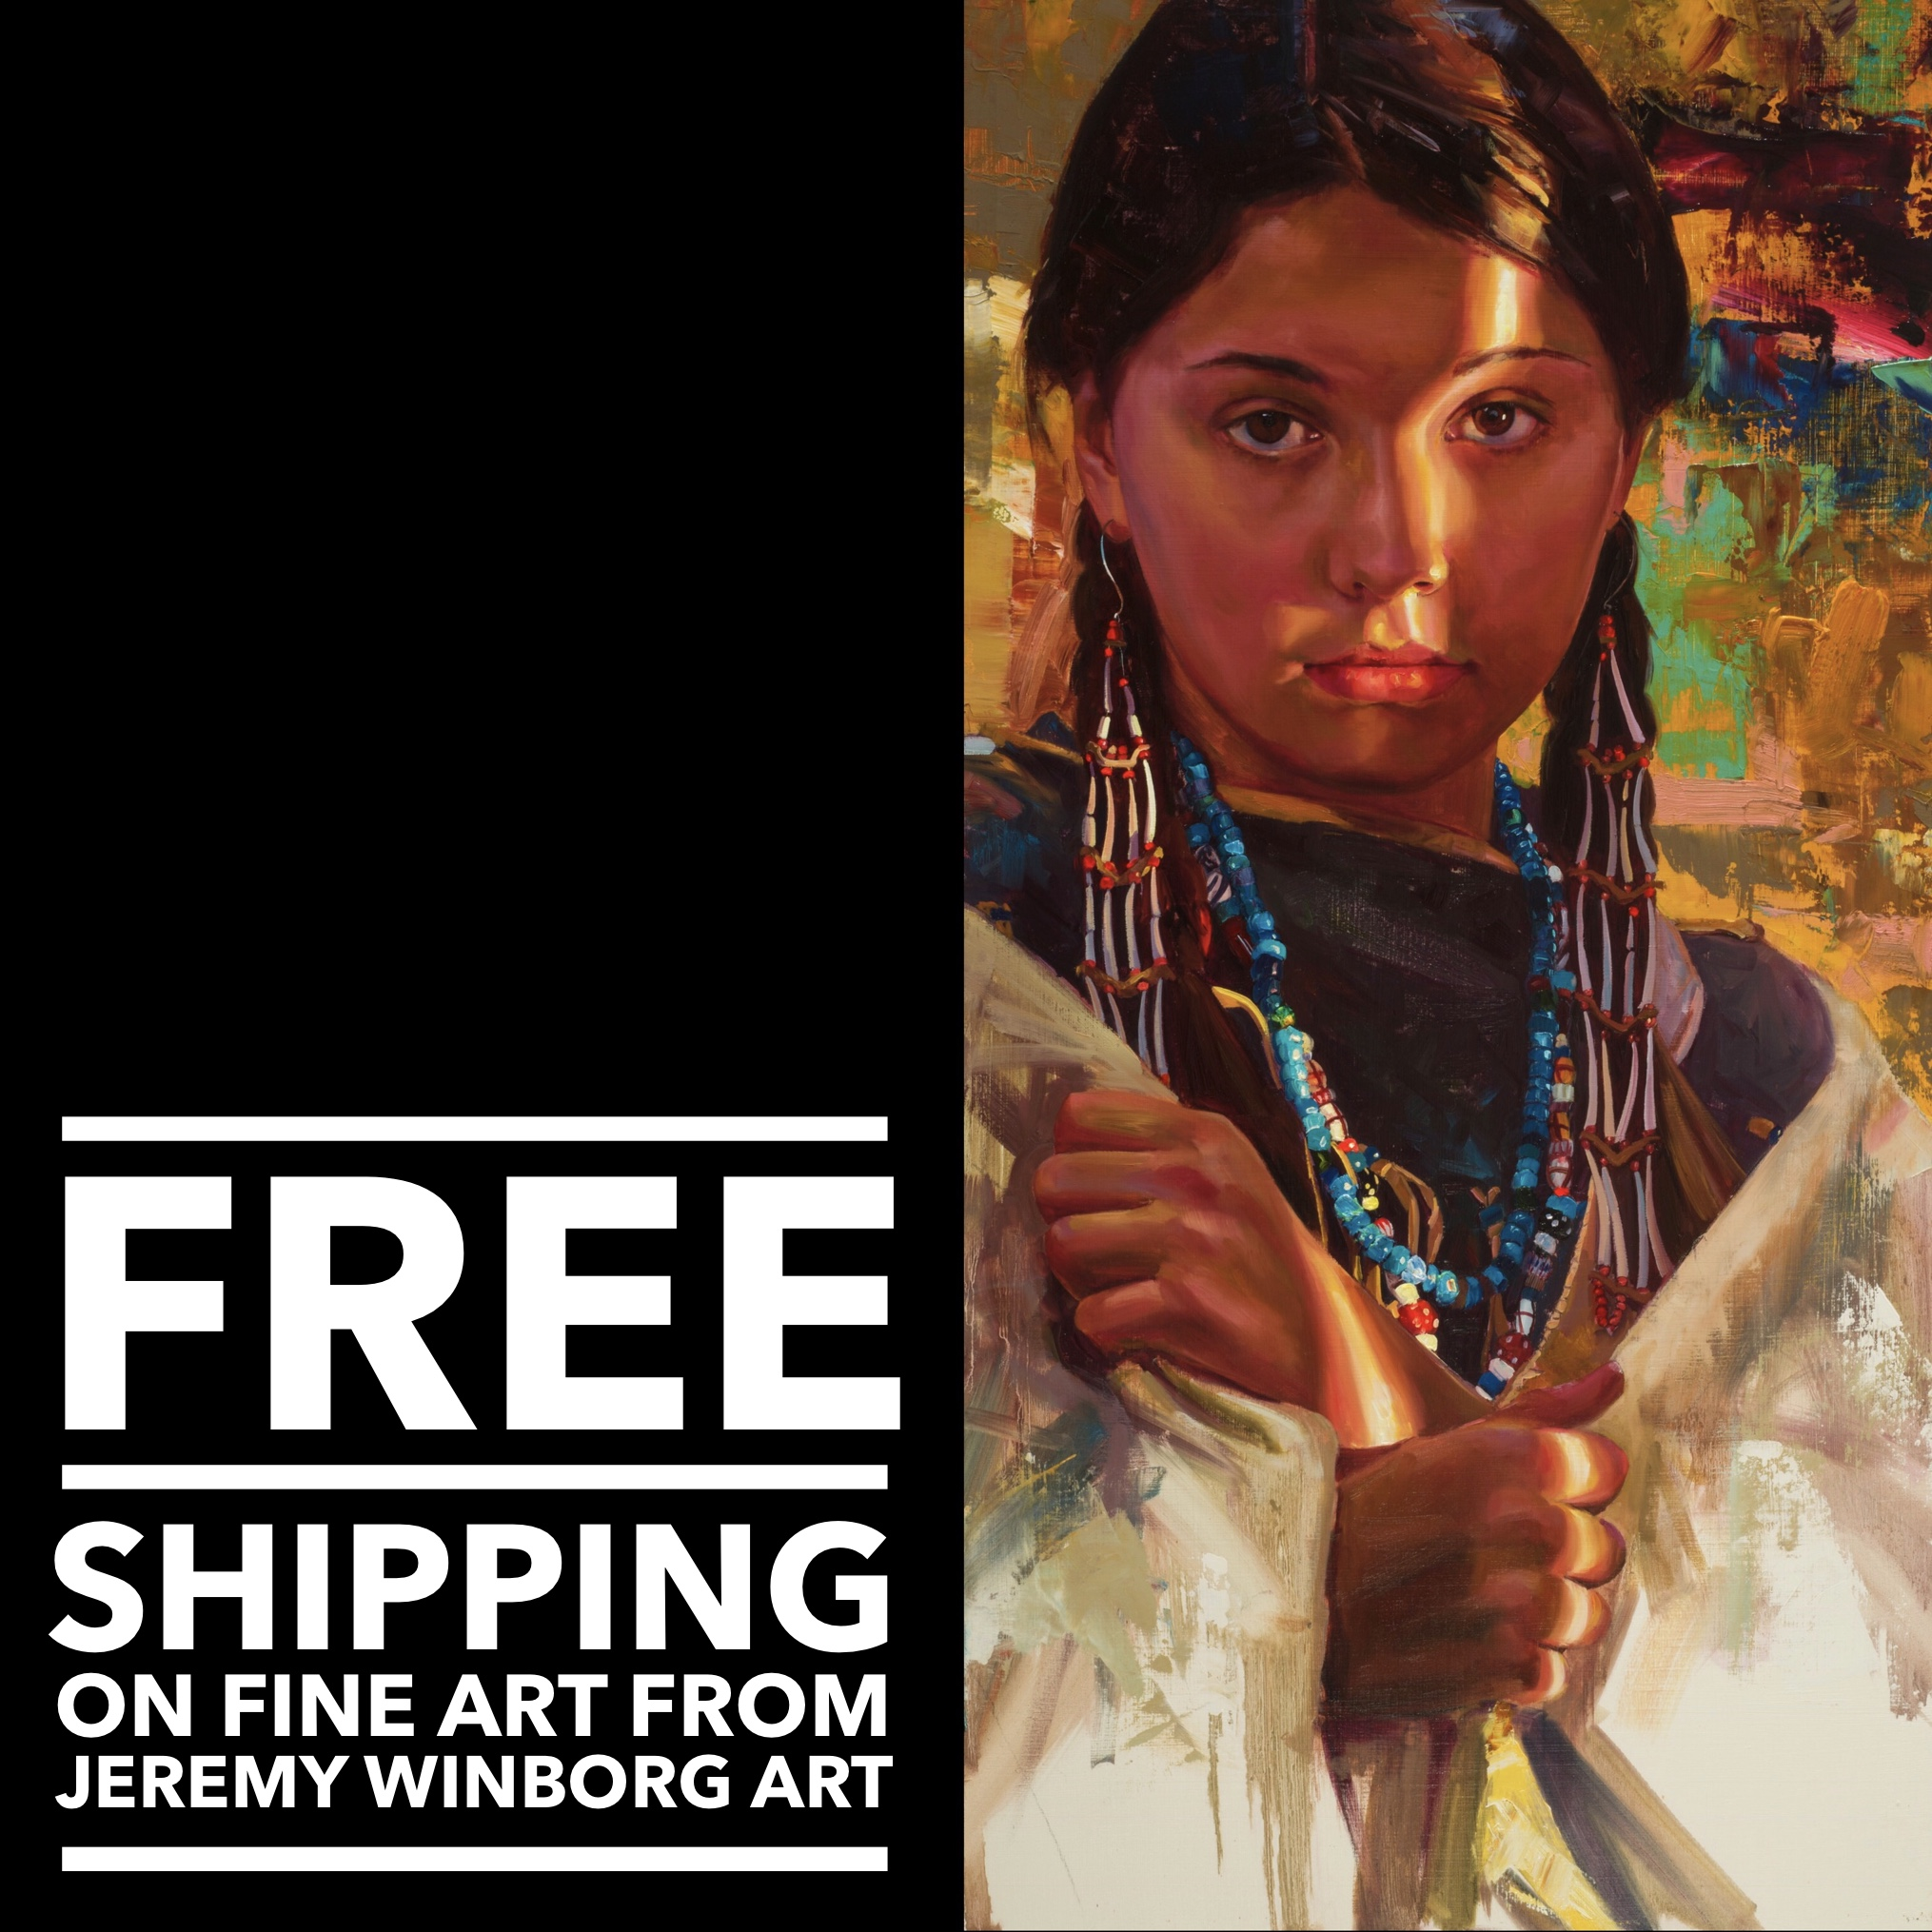 Free Shipping at Jeremy Winborg Art